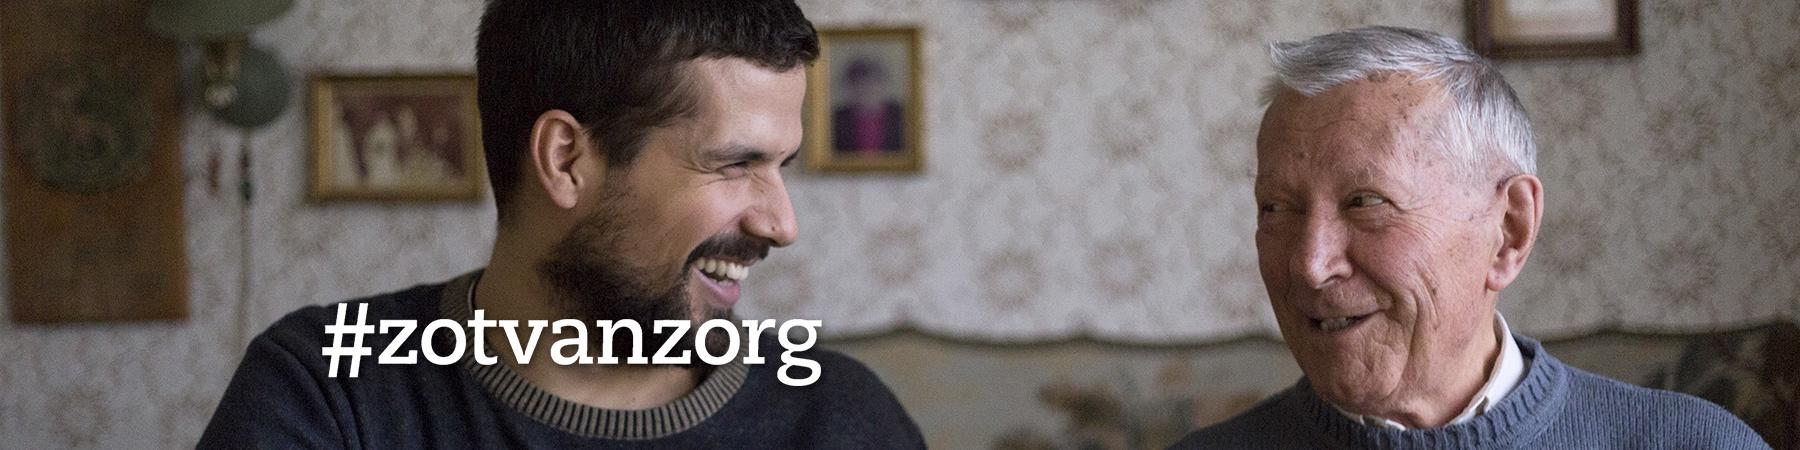 zotvanzorg_website_4_0.jpg